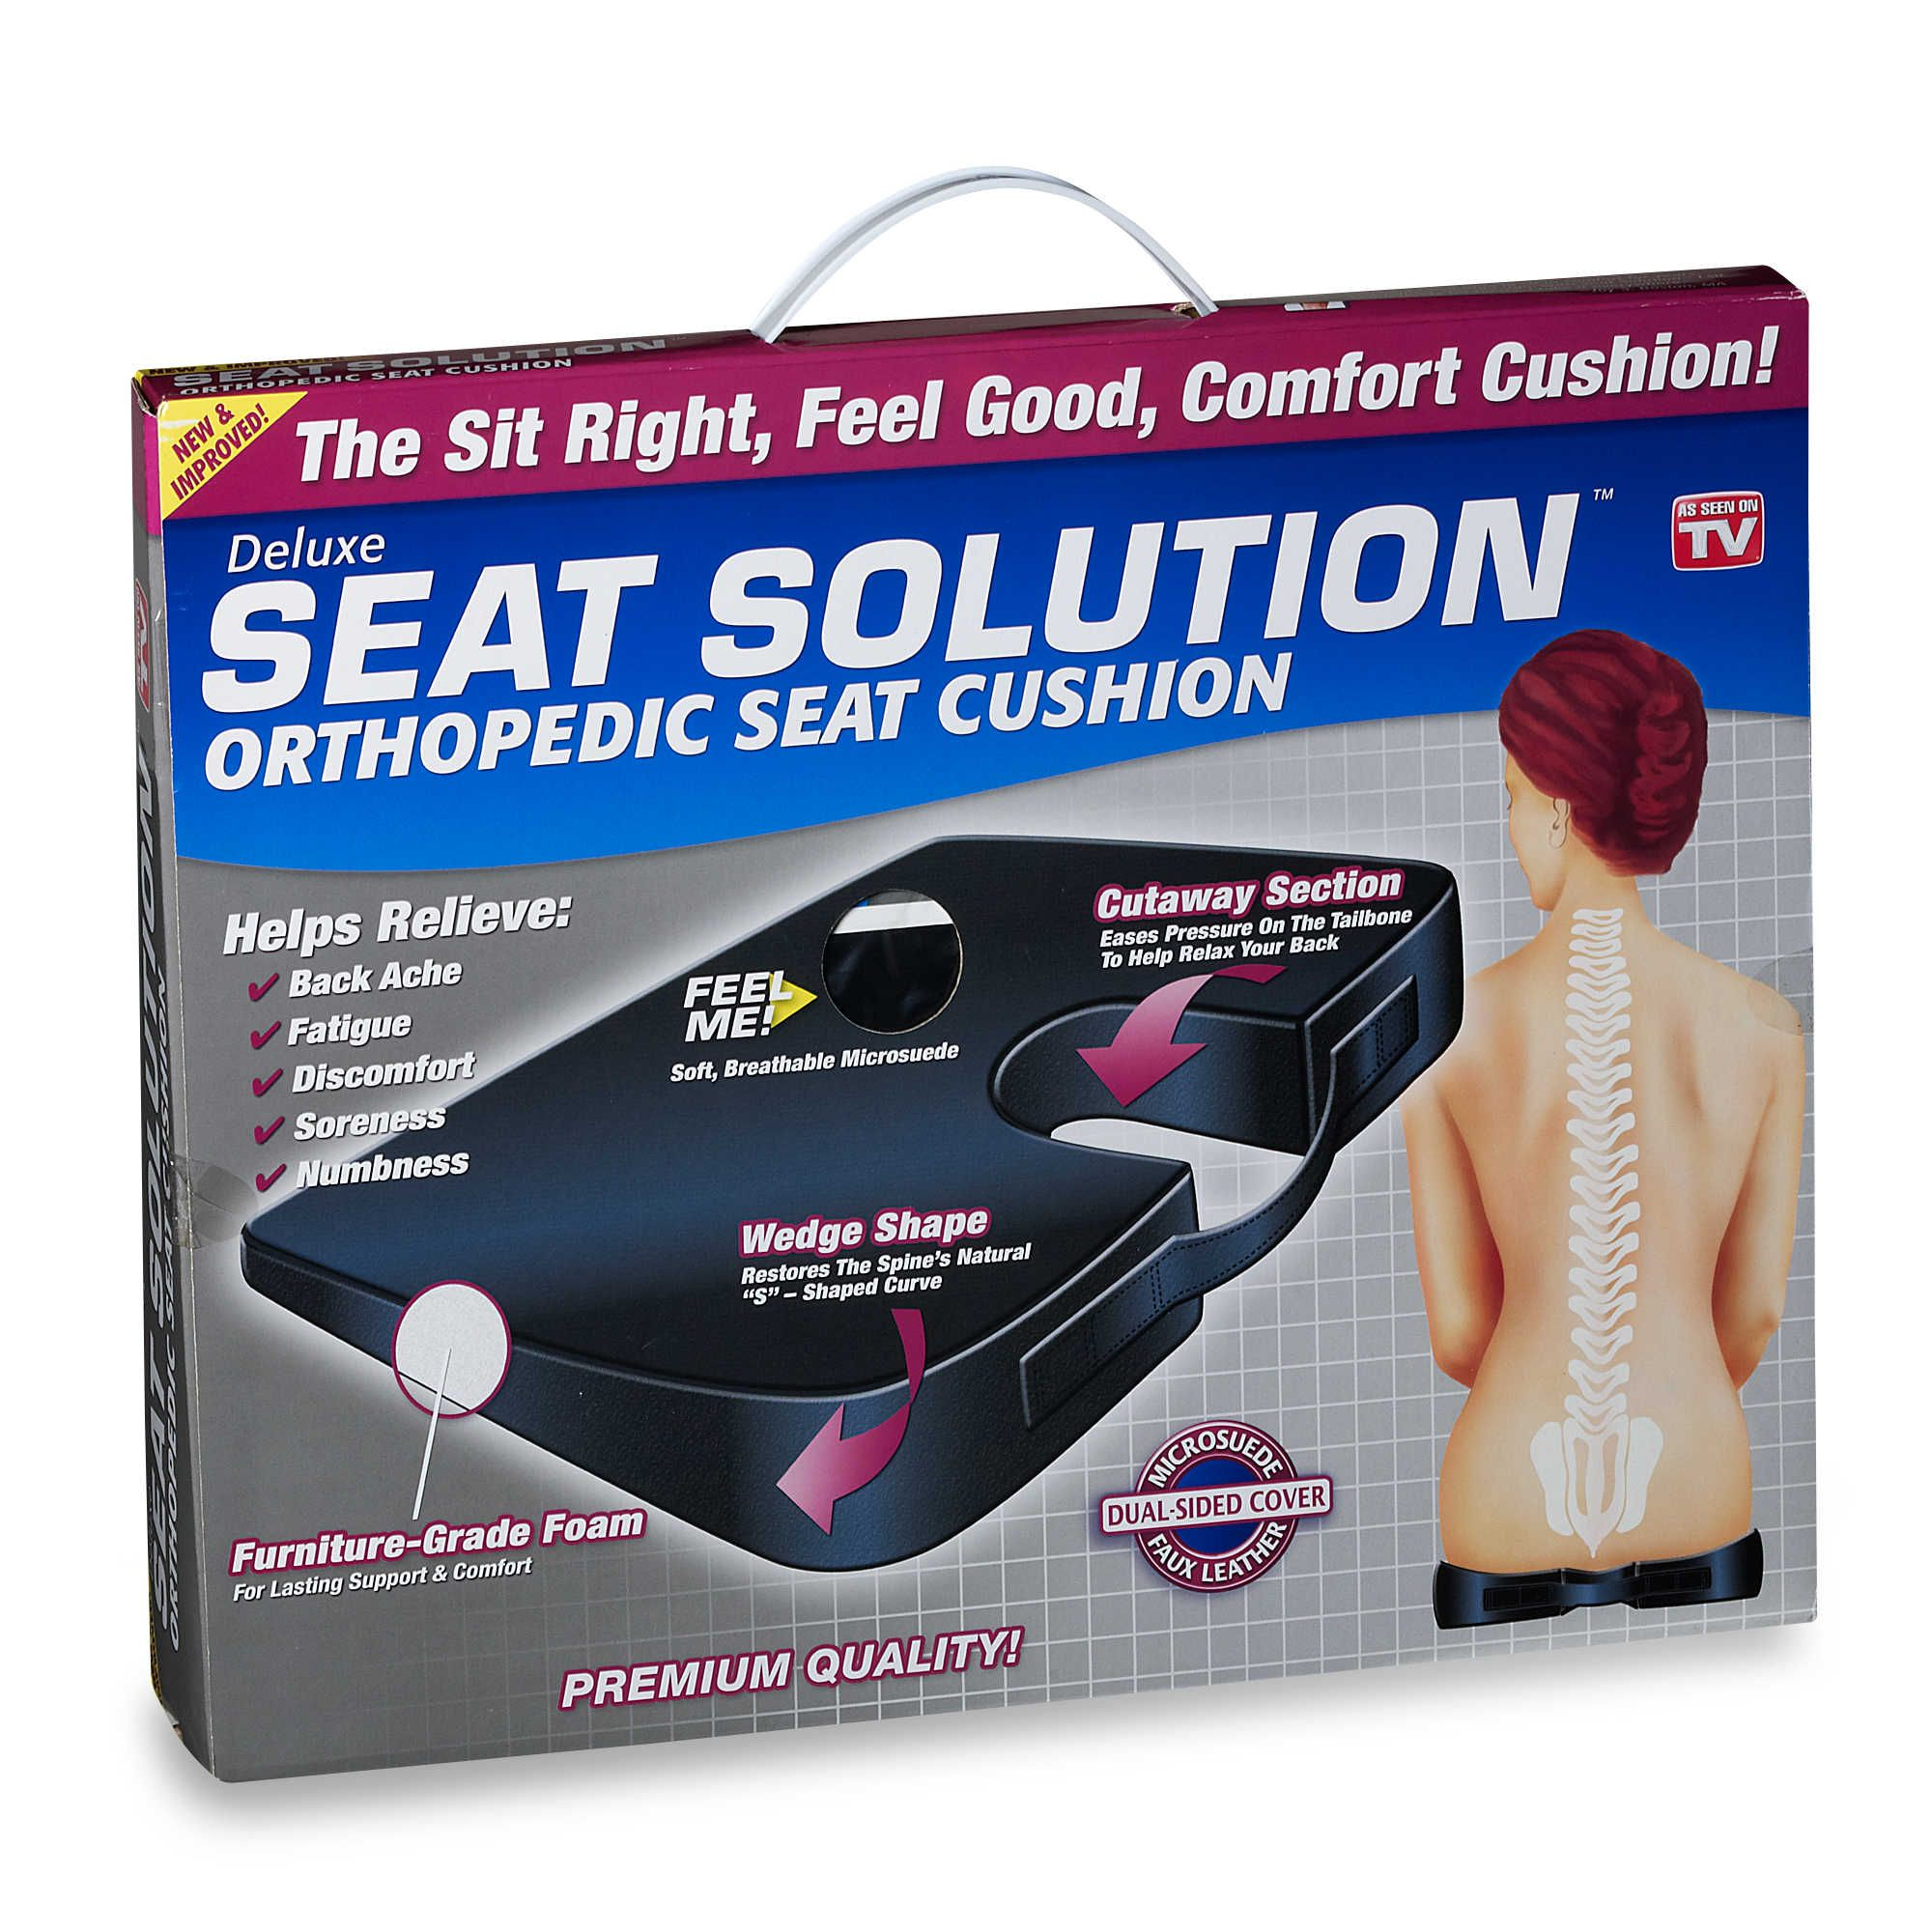 Seat Solution Orthopedic Seat Cushion With Images Orthopedic